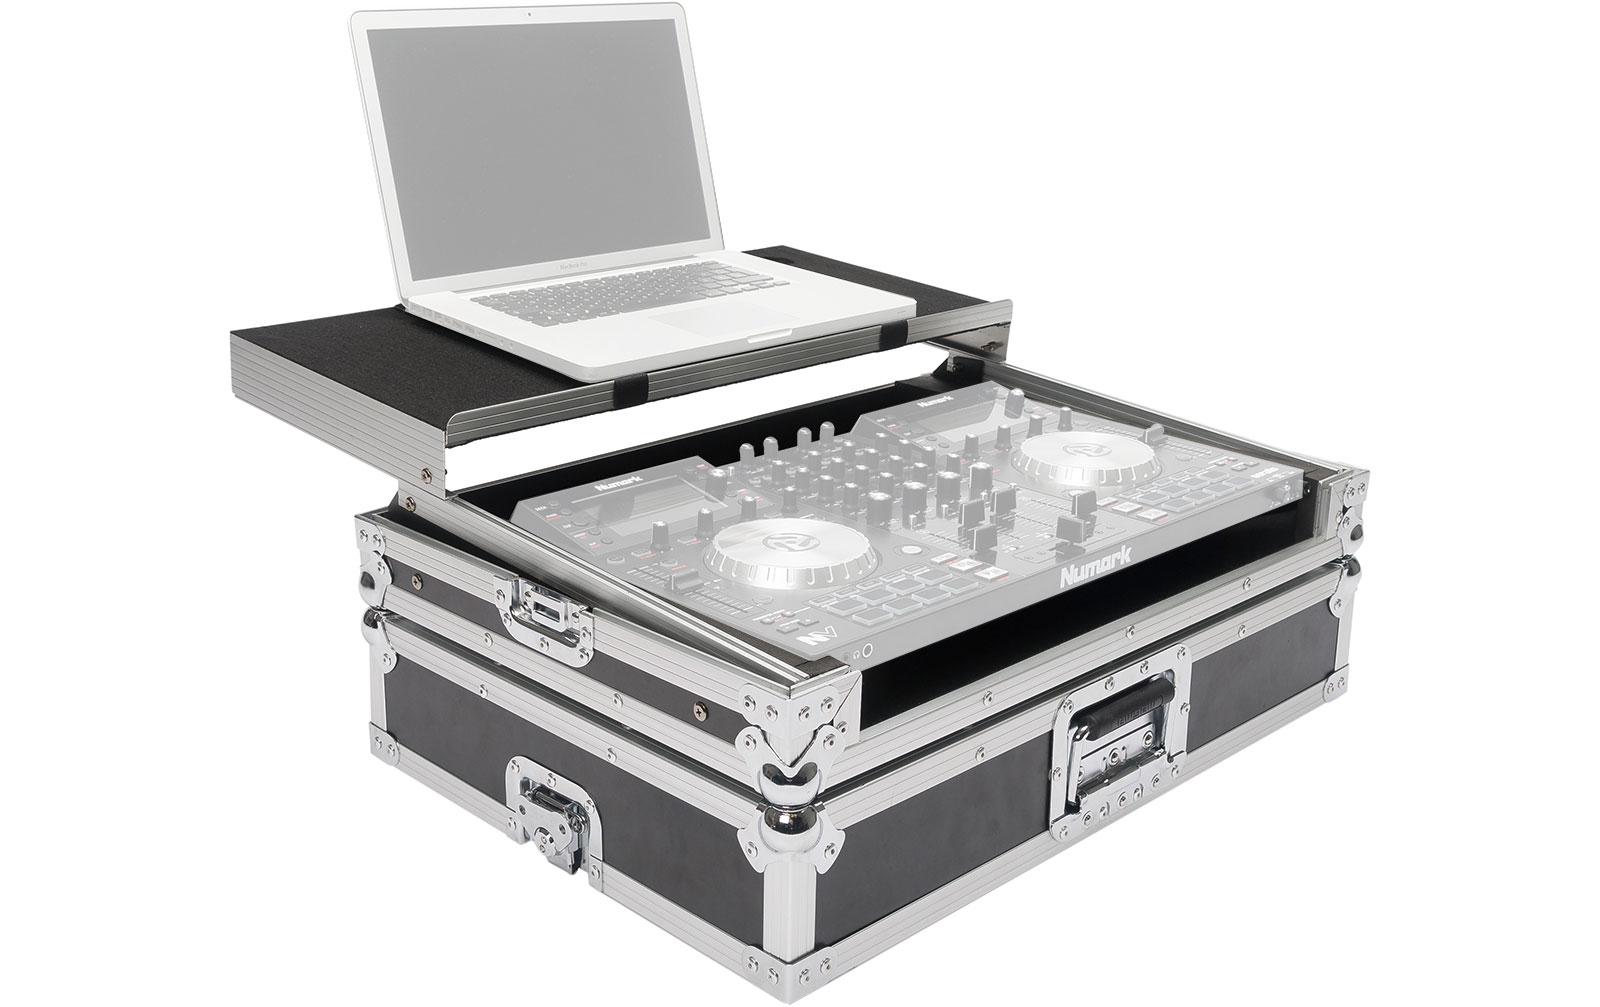 magma-dj-controller-workstation-nv-black-silver